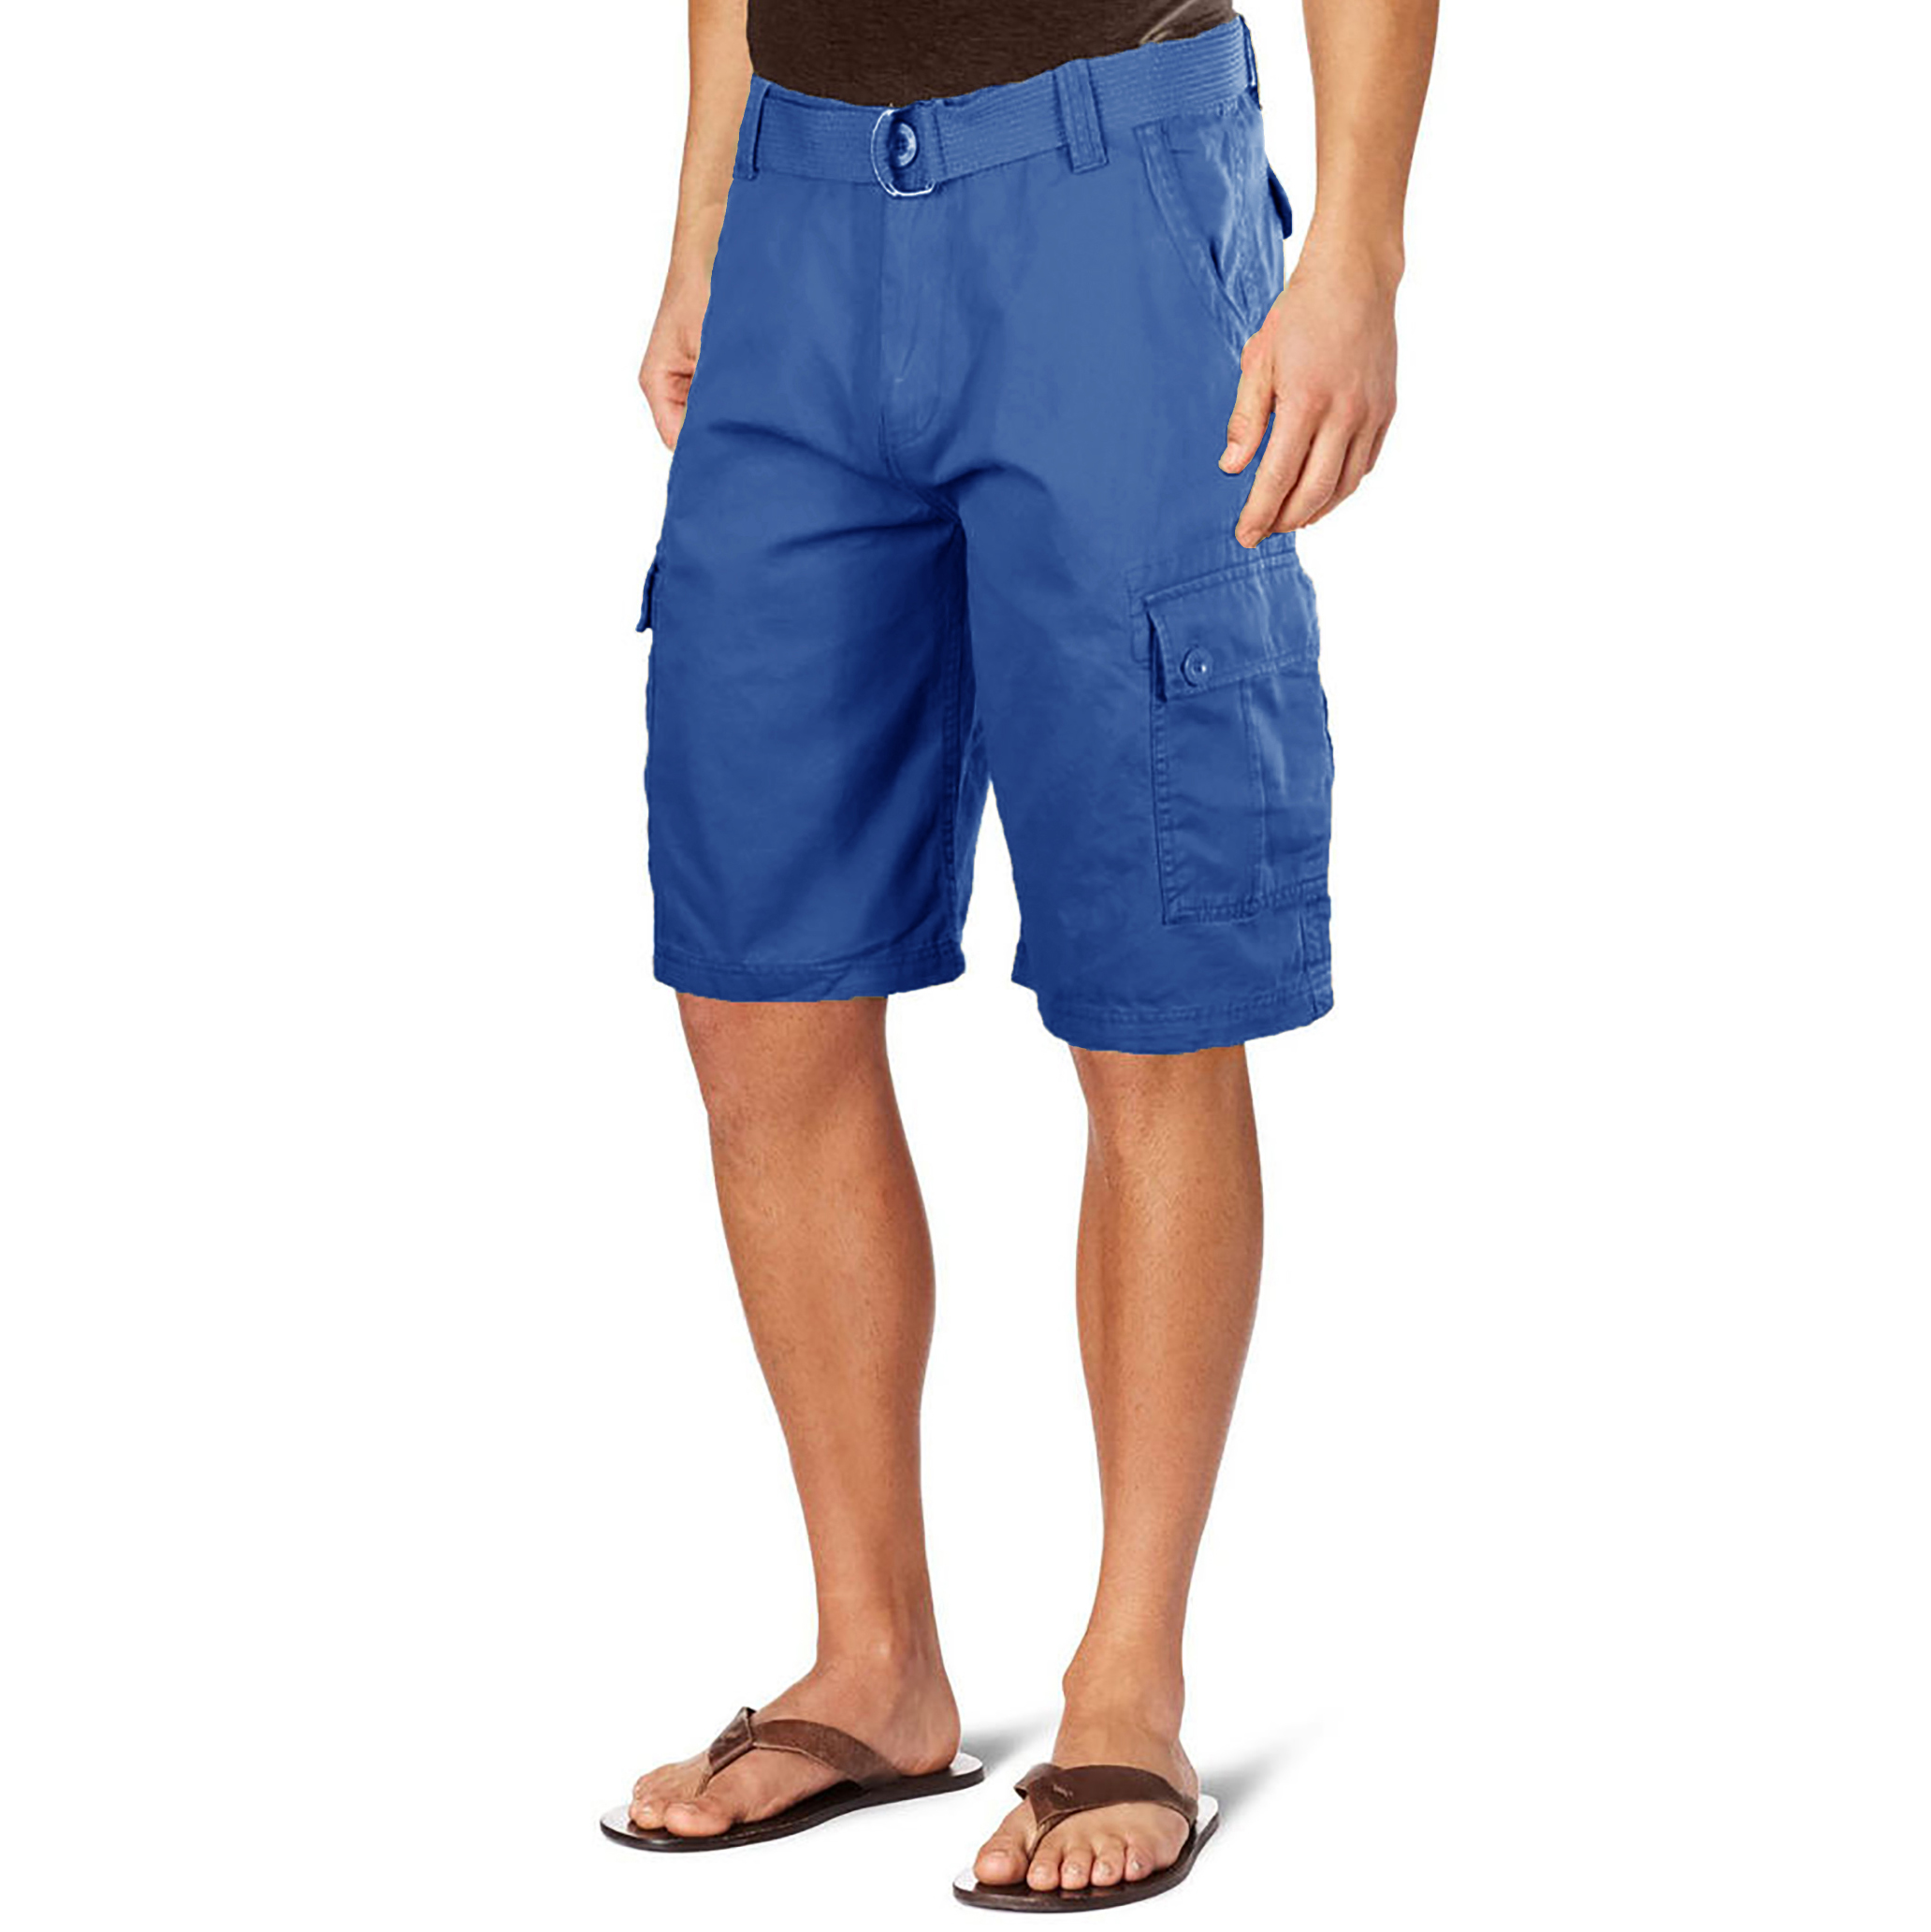 55dd10e1f2 2-Pack OTB Men's Belted Utility Cargo Shorts - Tanga